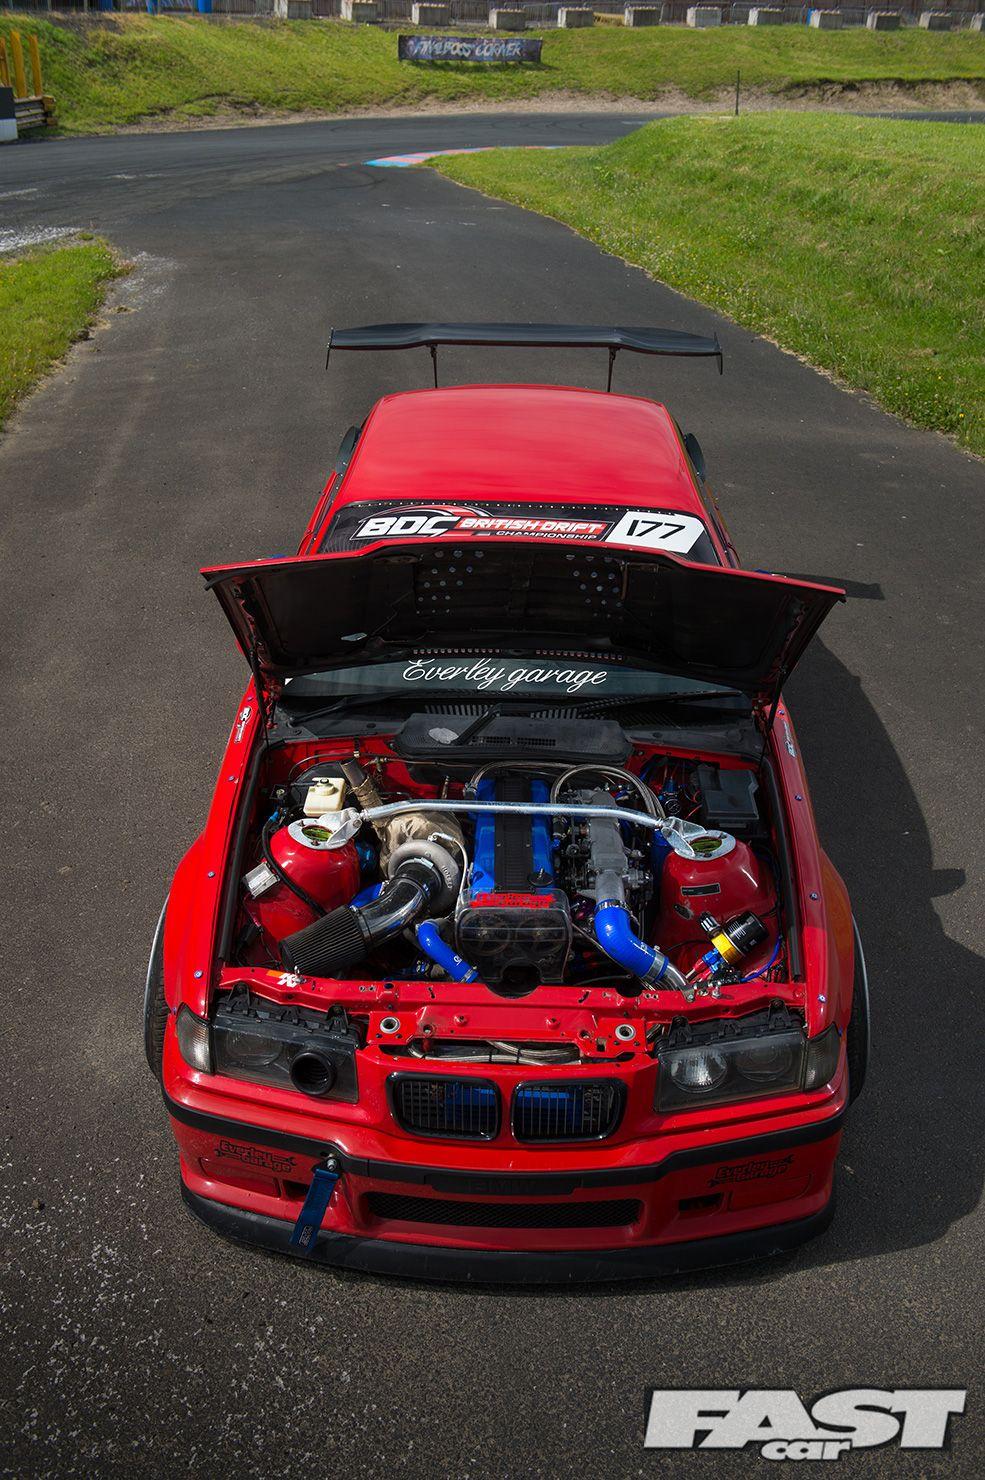 small resolution of bmw e36 toyota jz bdc drift car